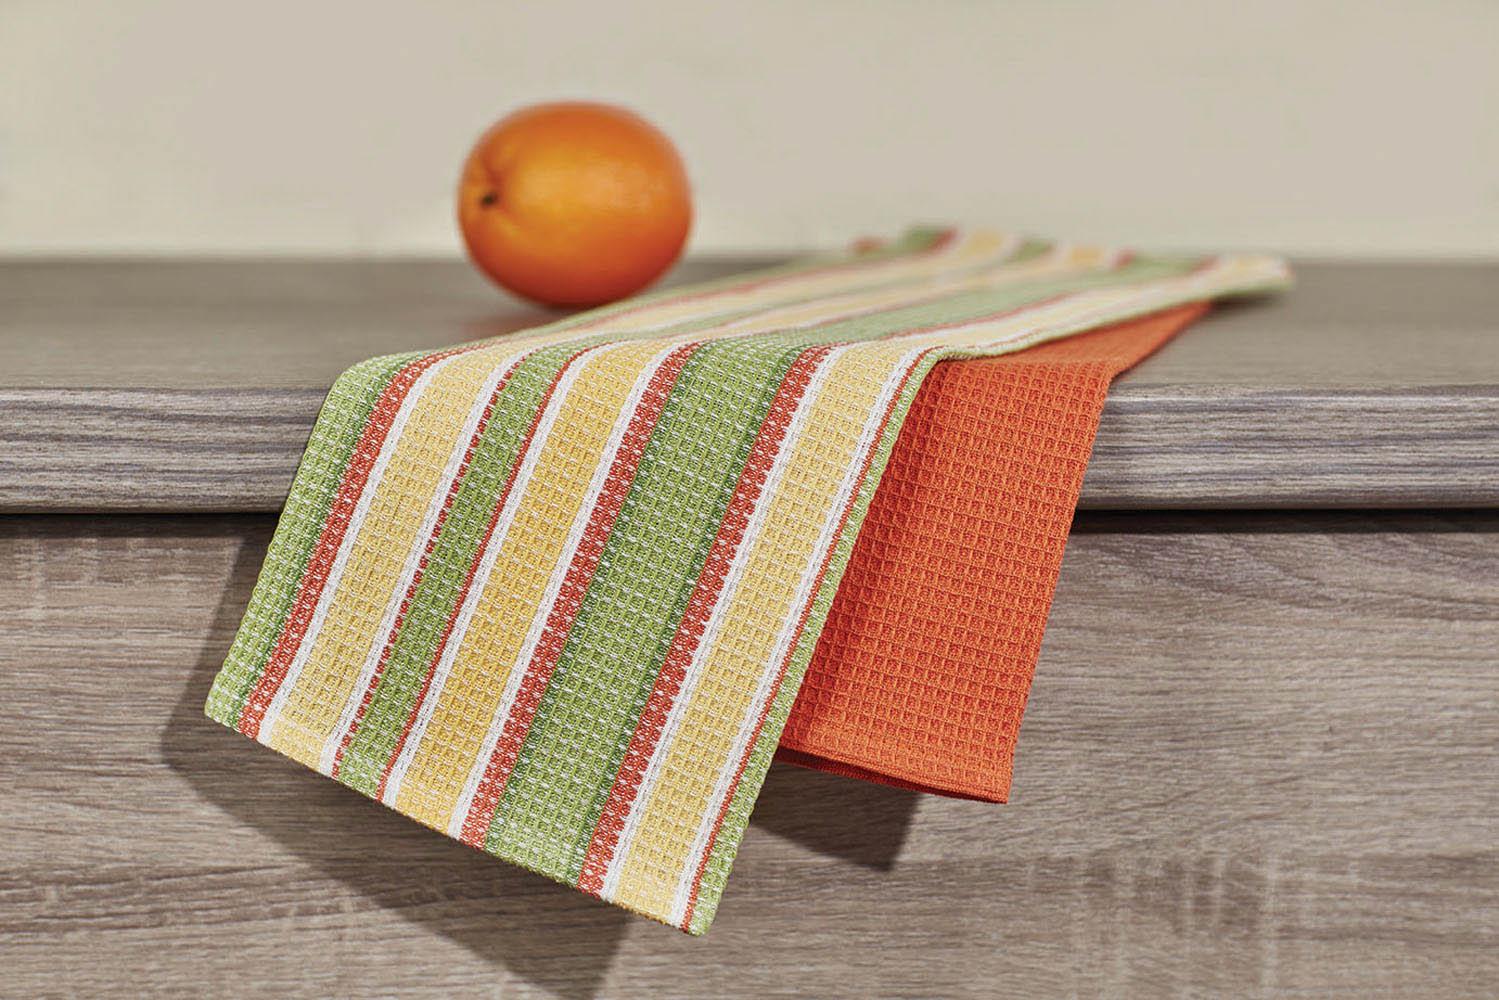 {} Primavelle Кухонное полотенце Latte Цвет: Зеленый (40х60 см - 2 шт) полотенце кухонное soavita цвет светло зеленый 40 х 60 см 48803